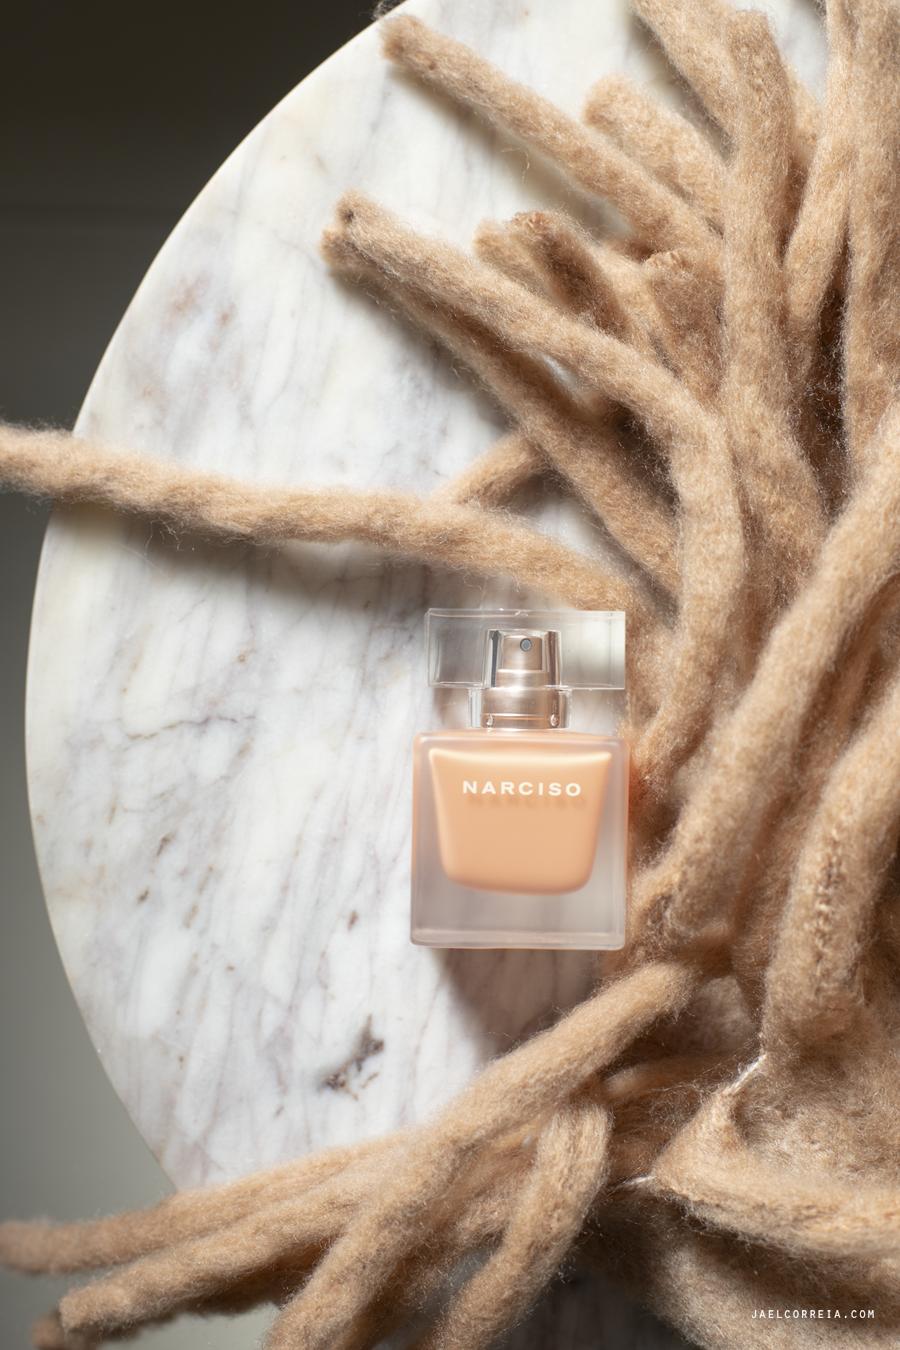 Narciso Eau Néroli Ambrée Eau de Toilette para mulheres notino pt loja online perfumes baratos perfumaria jael correia portugal beleza beauty